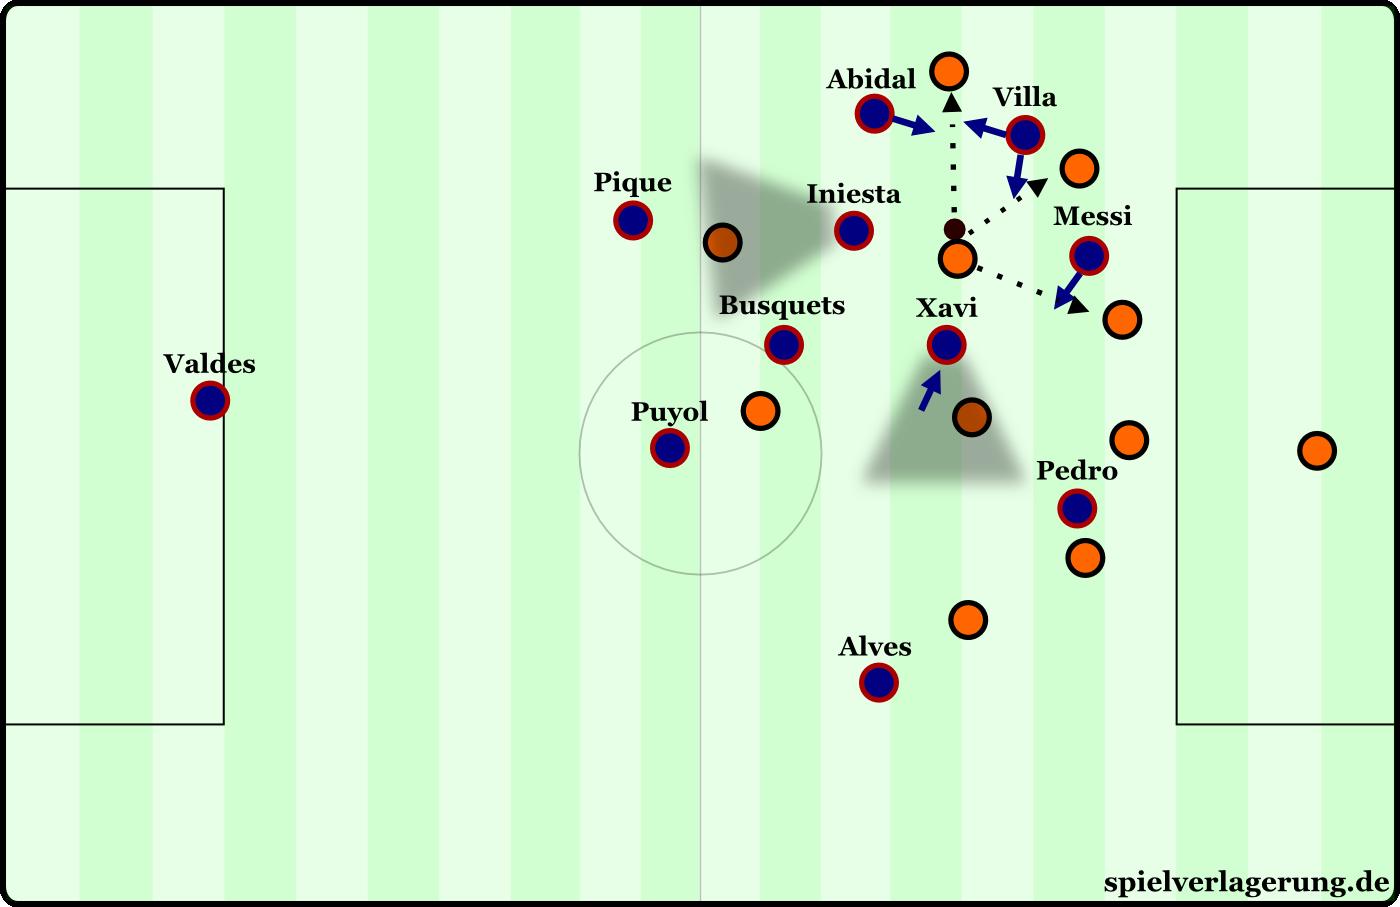 Guardiola's passing-lane-oriented counterpressing.